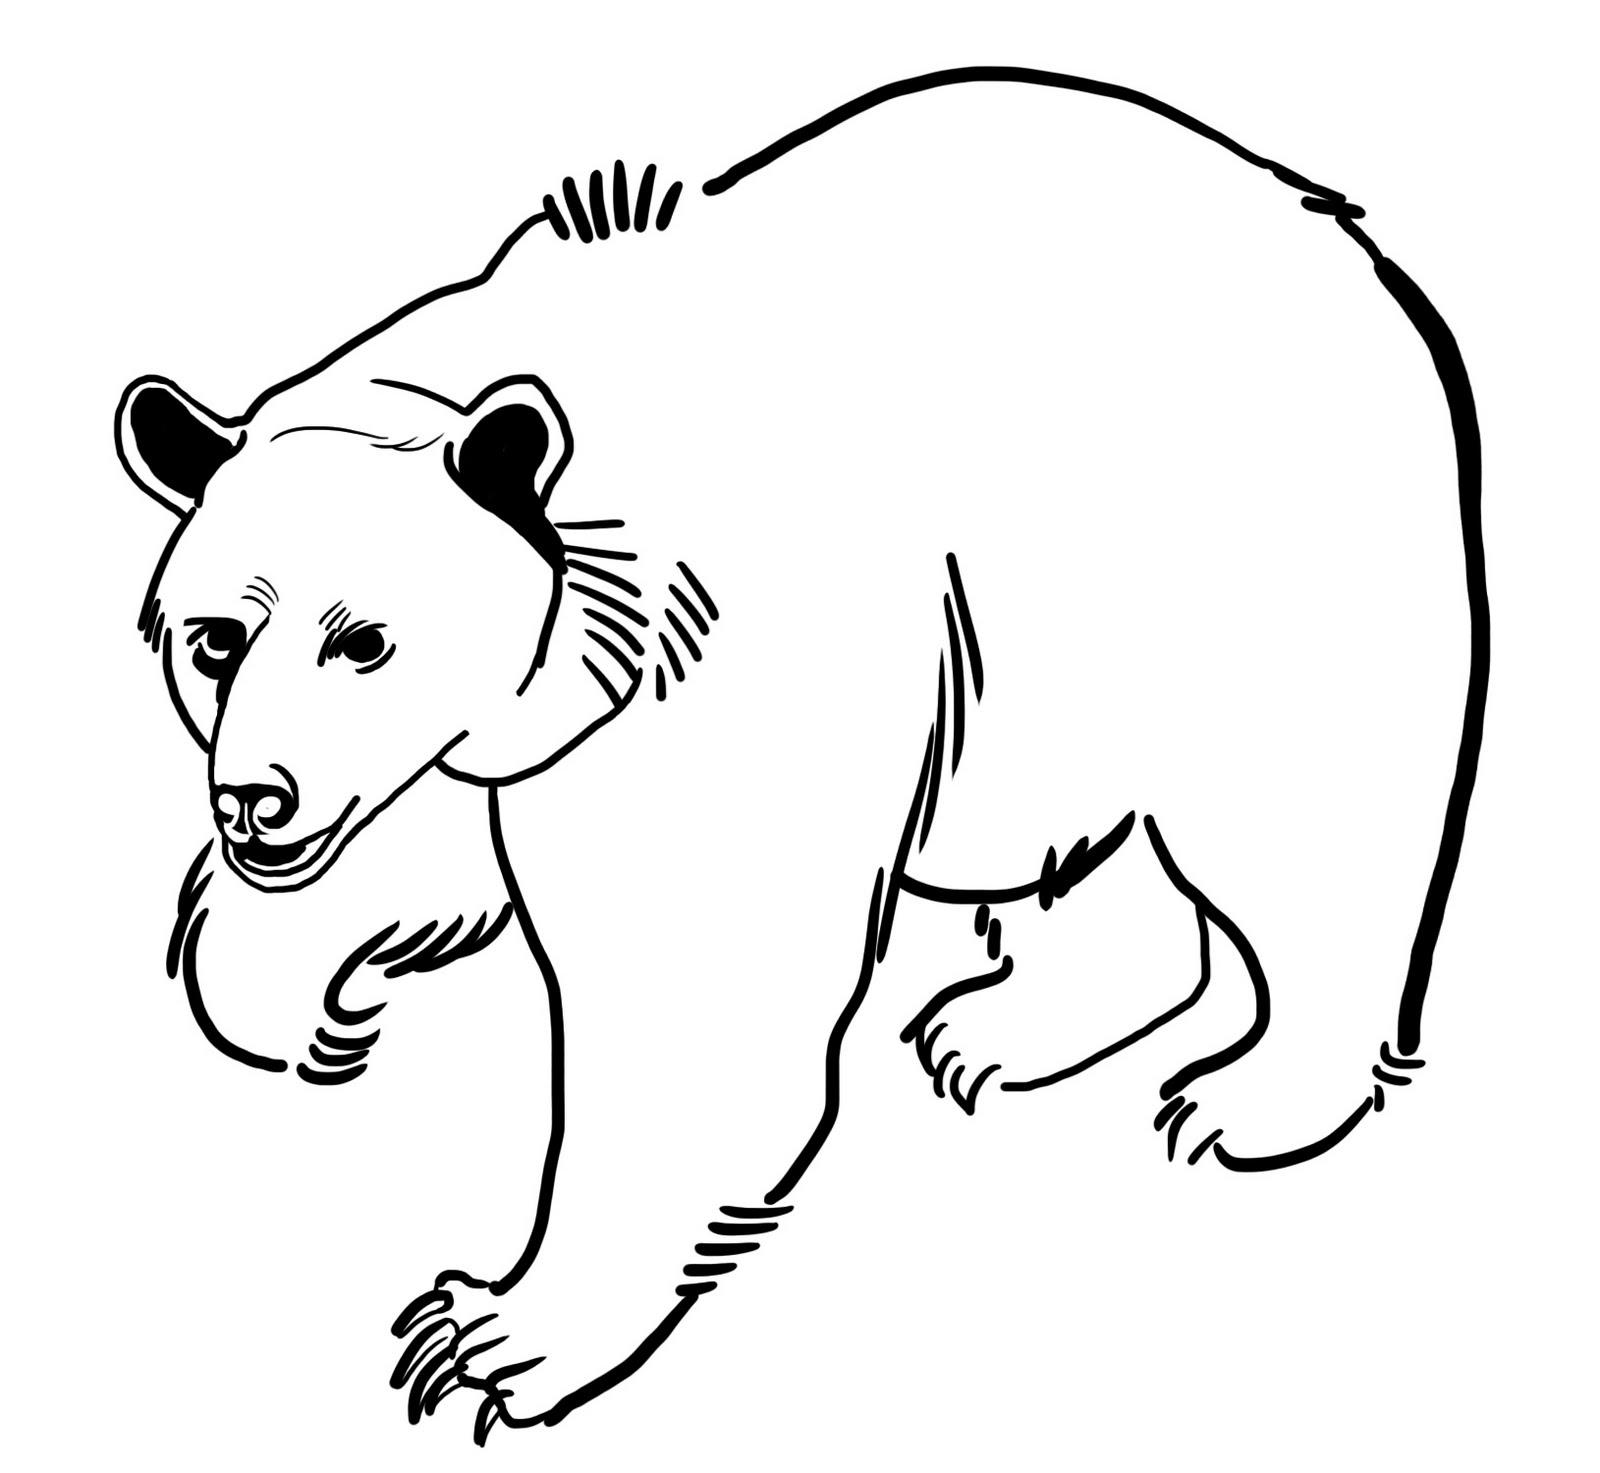 Dessin ours polaire imprimer - Ours a dessiner ...